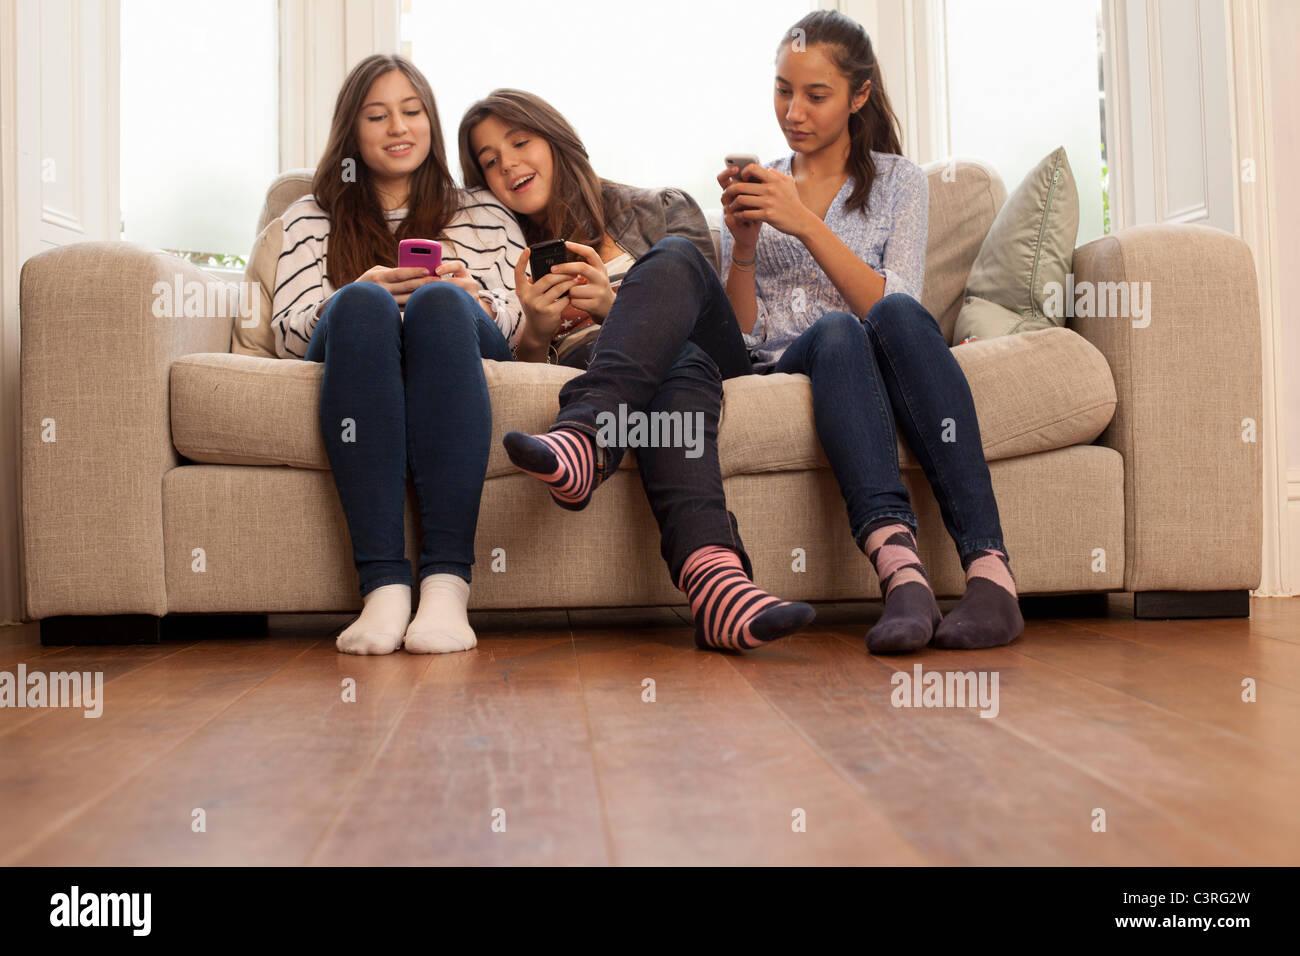 teenage girls sitting on sofa looking at phones Stock Photo 36782225  Alamy